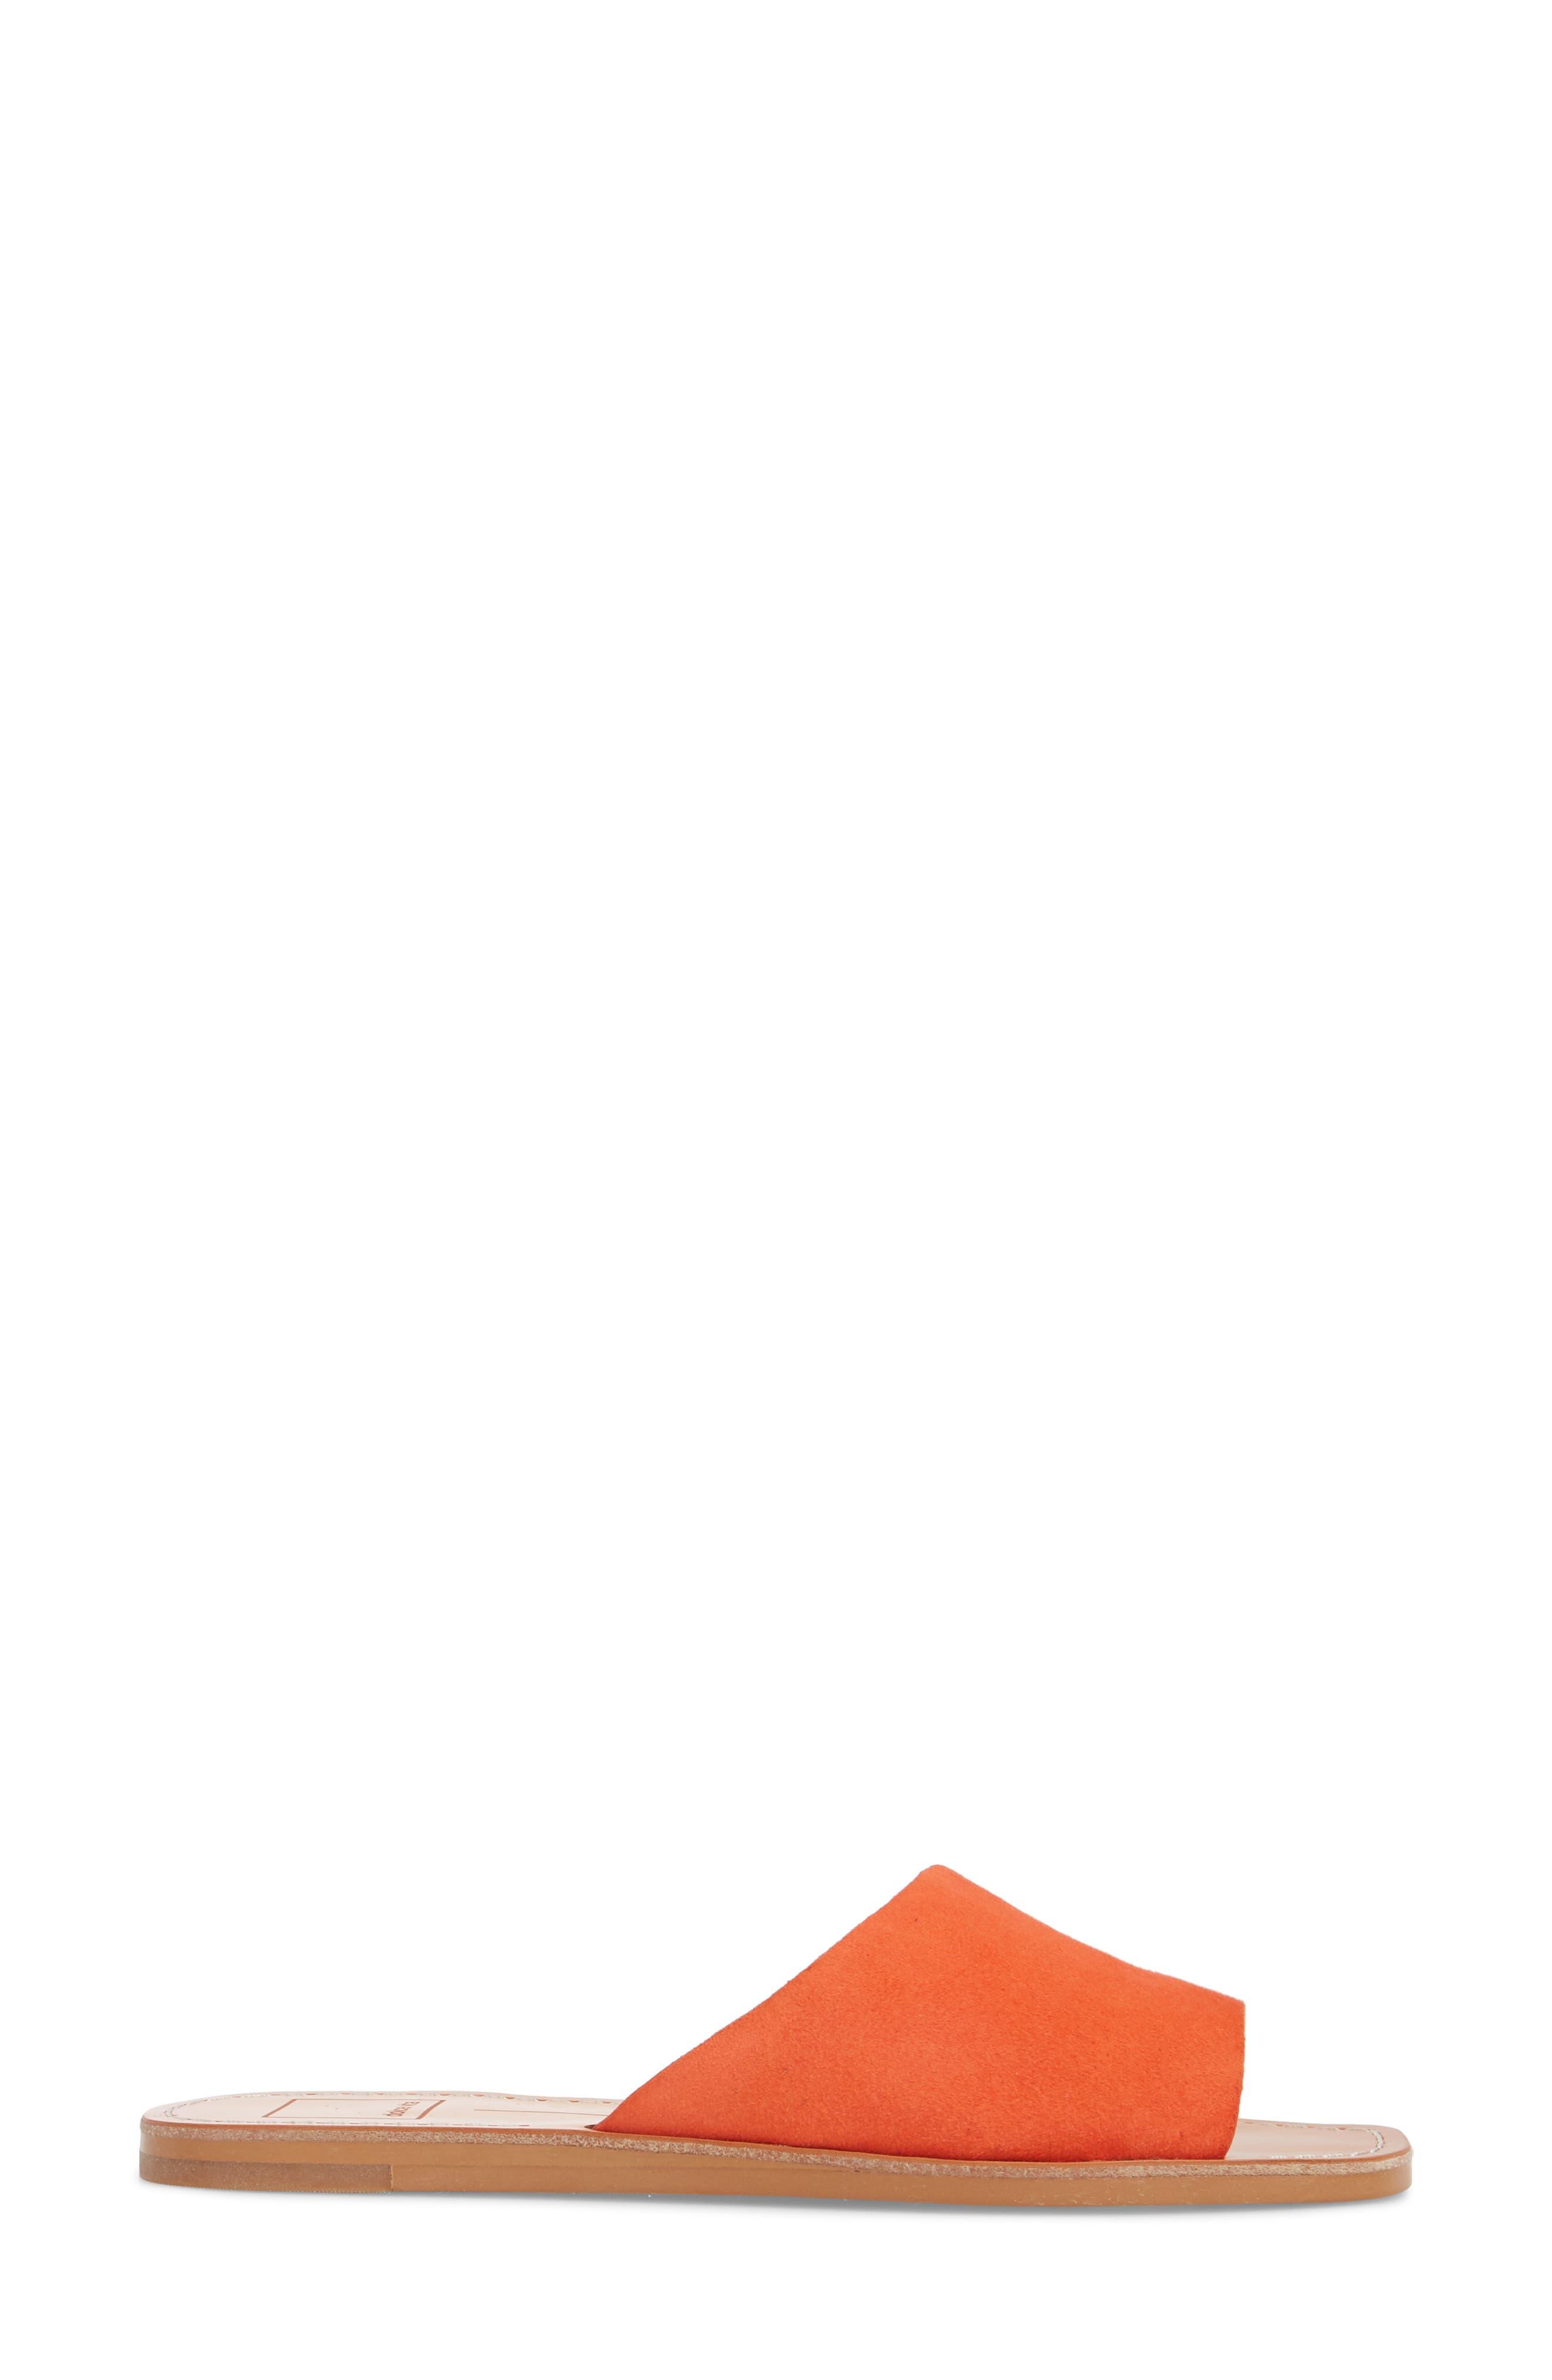 Cato Asymmetrical Slide Sandal,                             Alternate thumbnail 3, color,                             Orange Suede